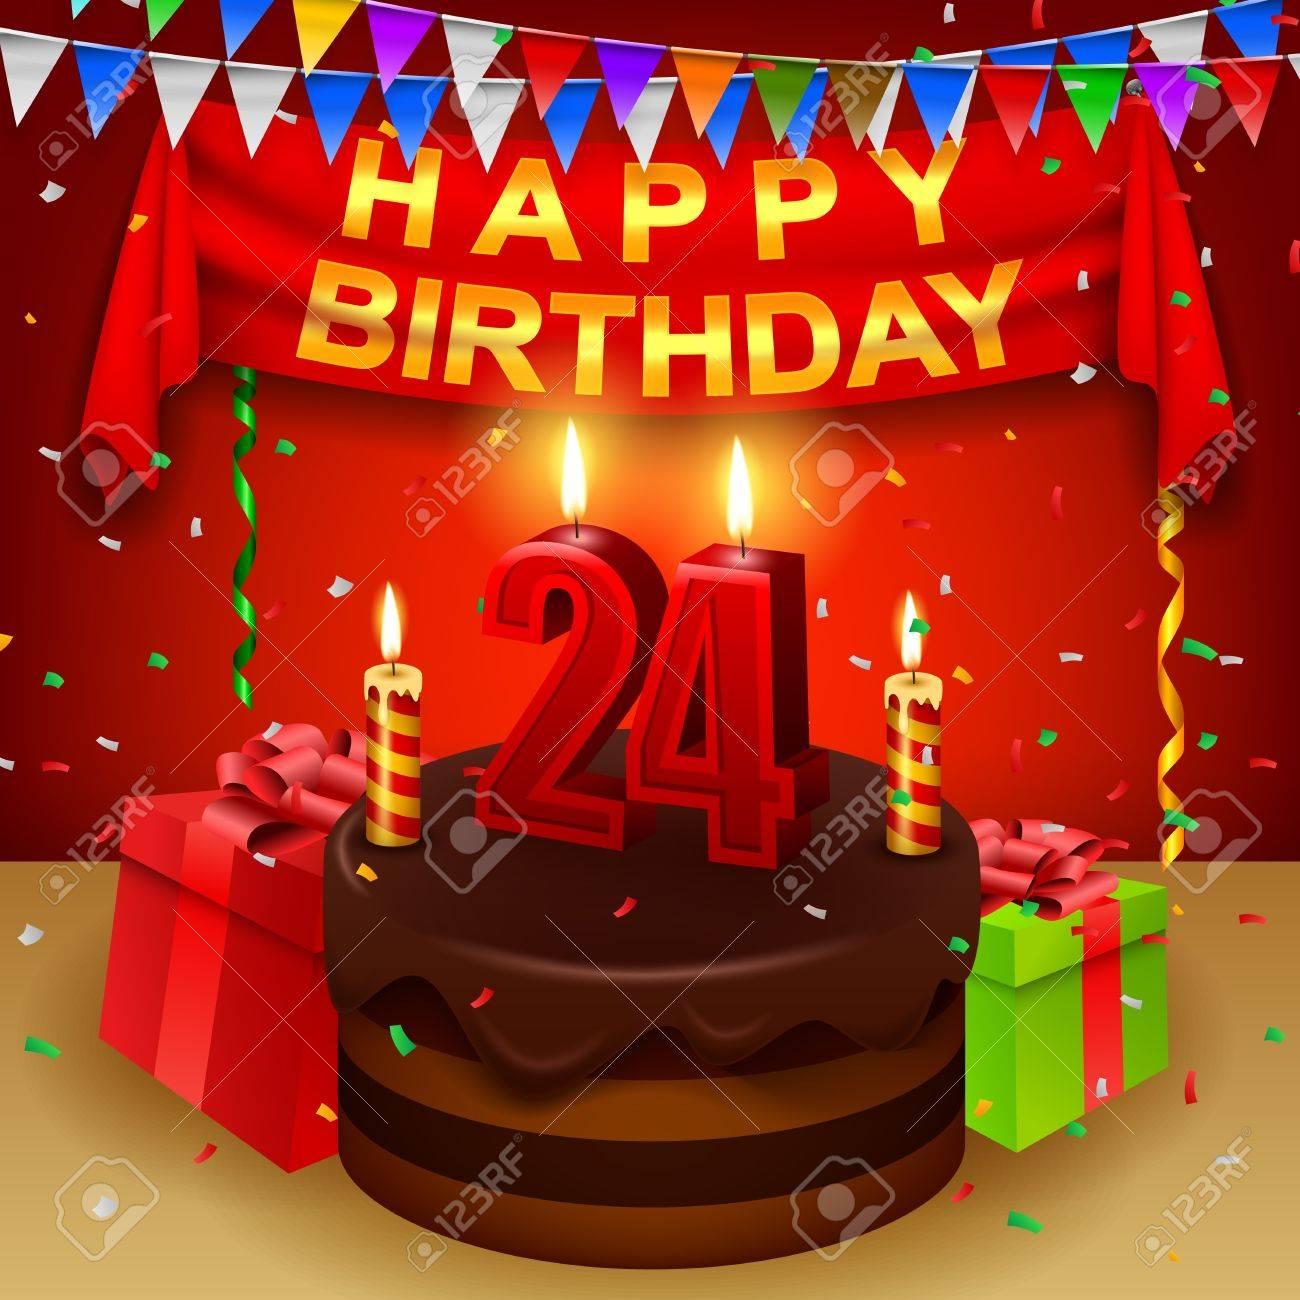 happy 24th birthday with chocolate cream cake and triangular